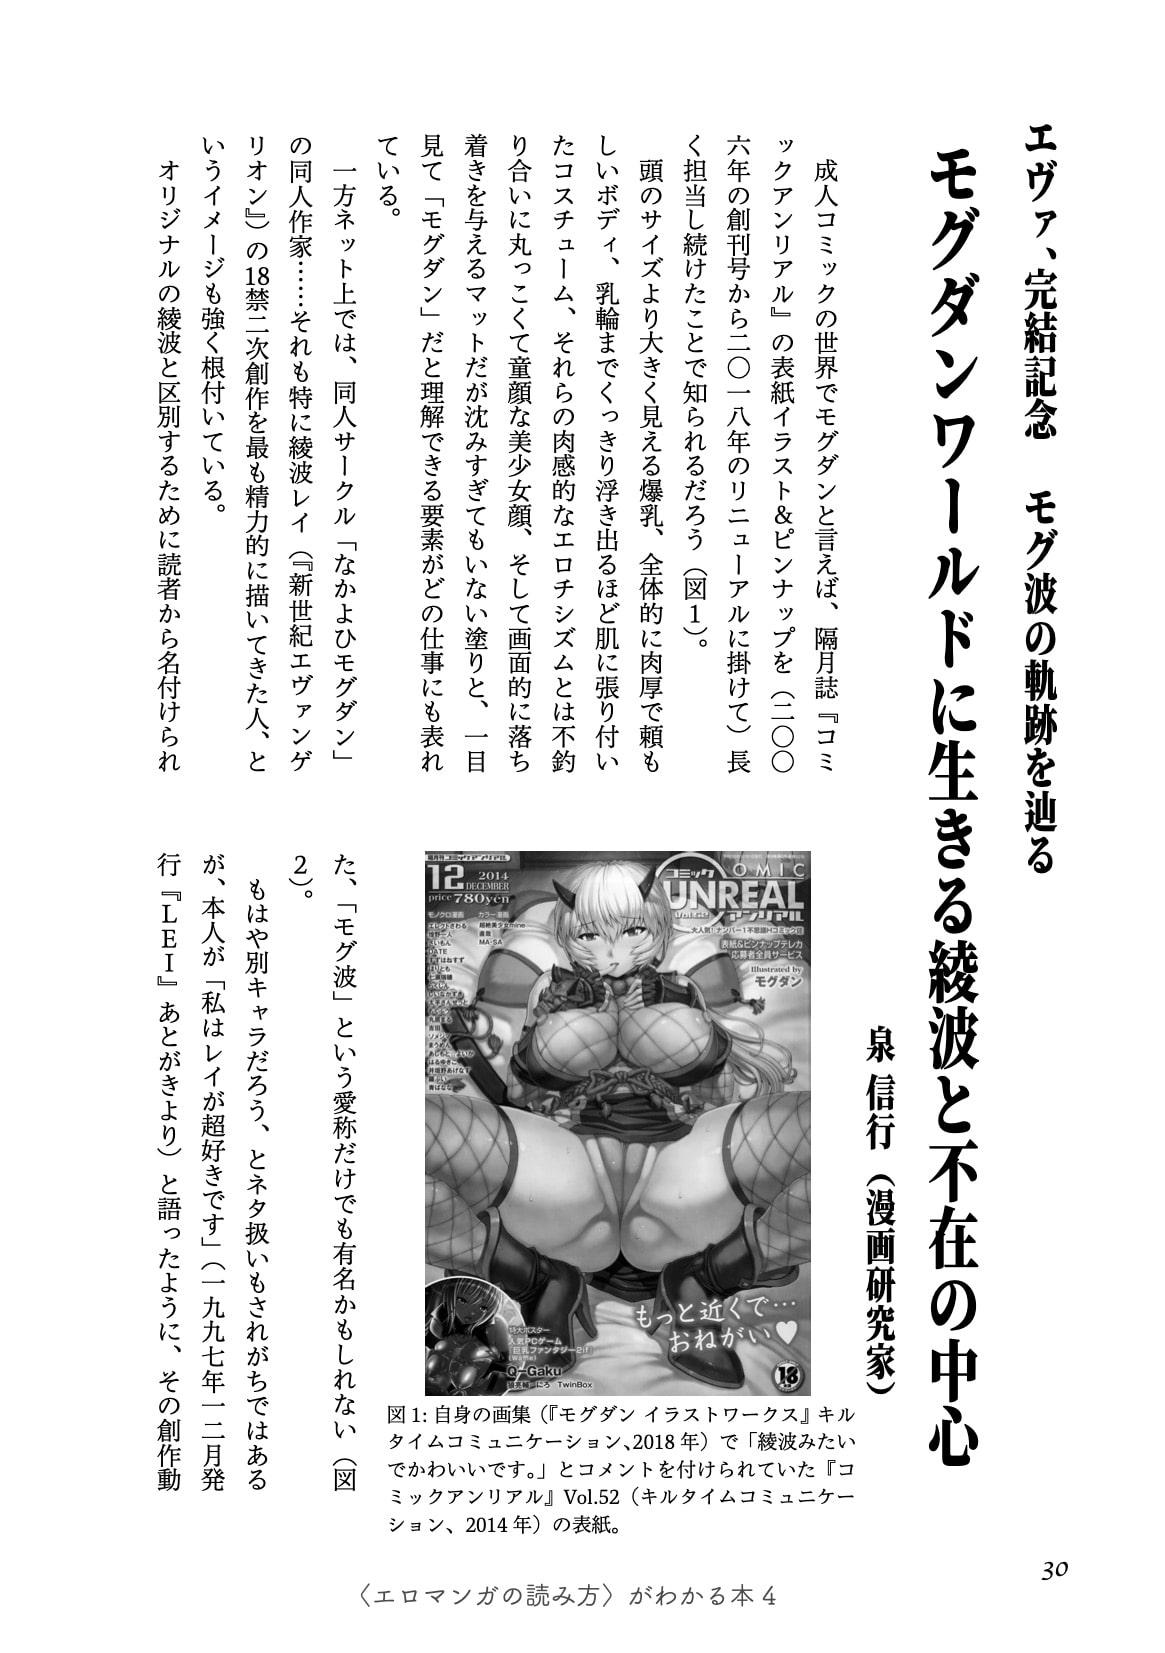 RJ328503 〈エロマンガの読み方〉がわかる本4 特集爆乳超乳 [20210606]